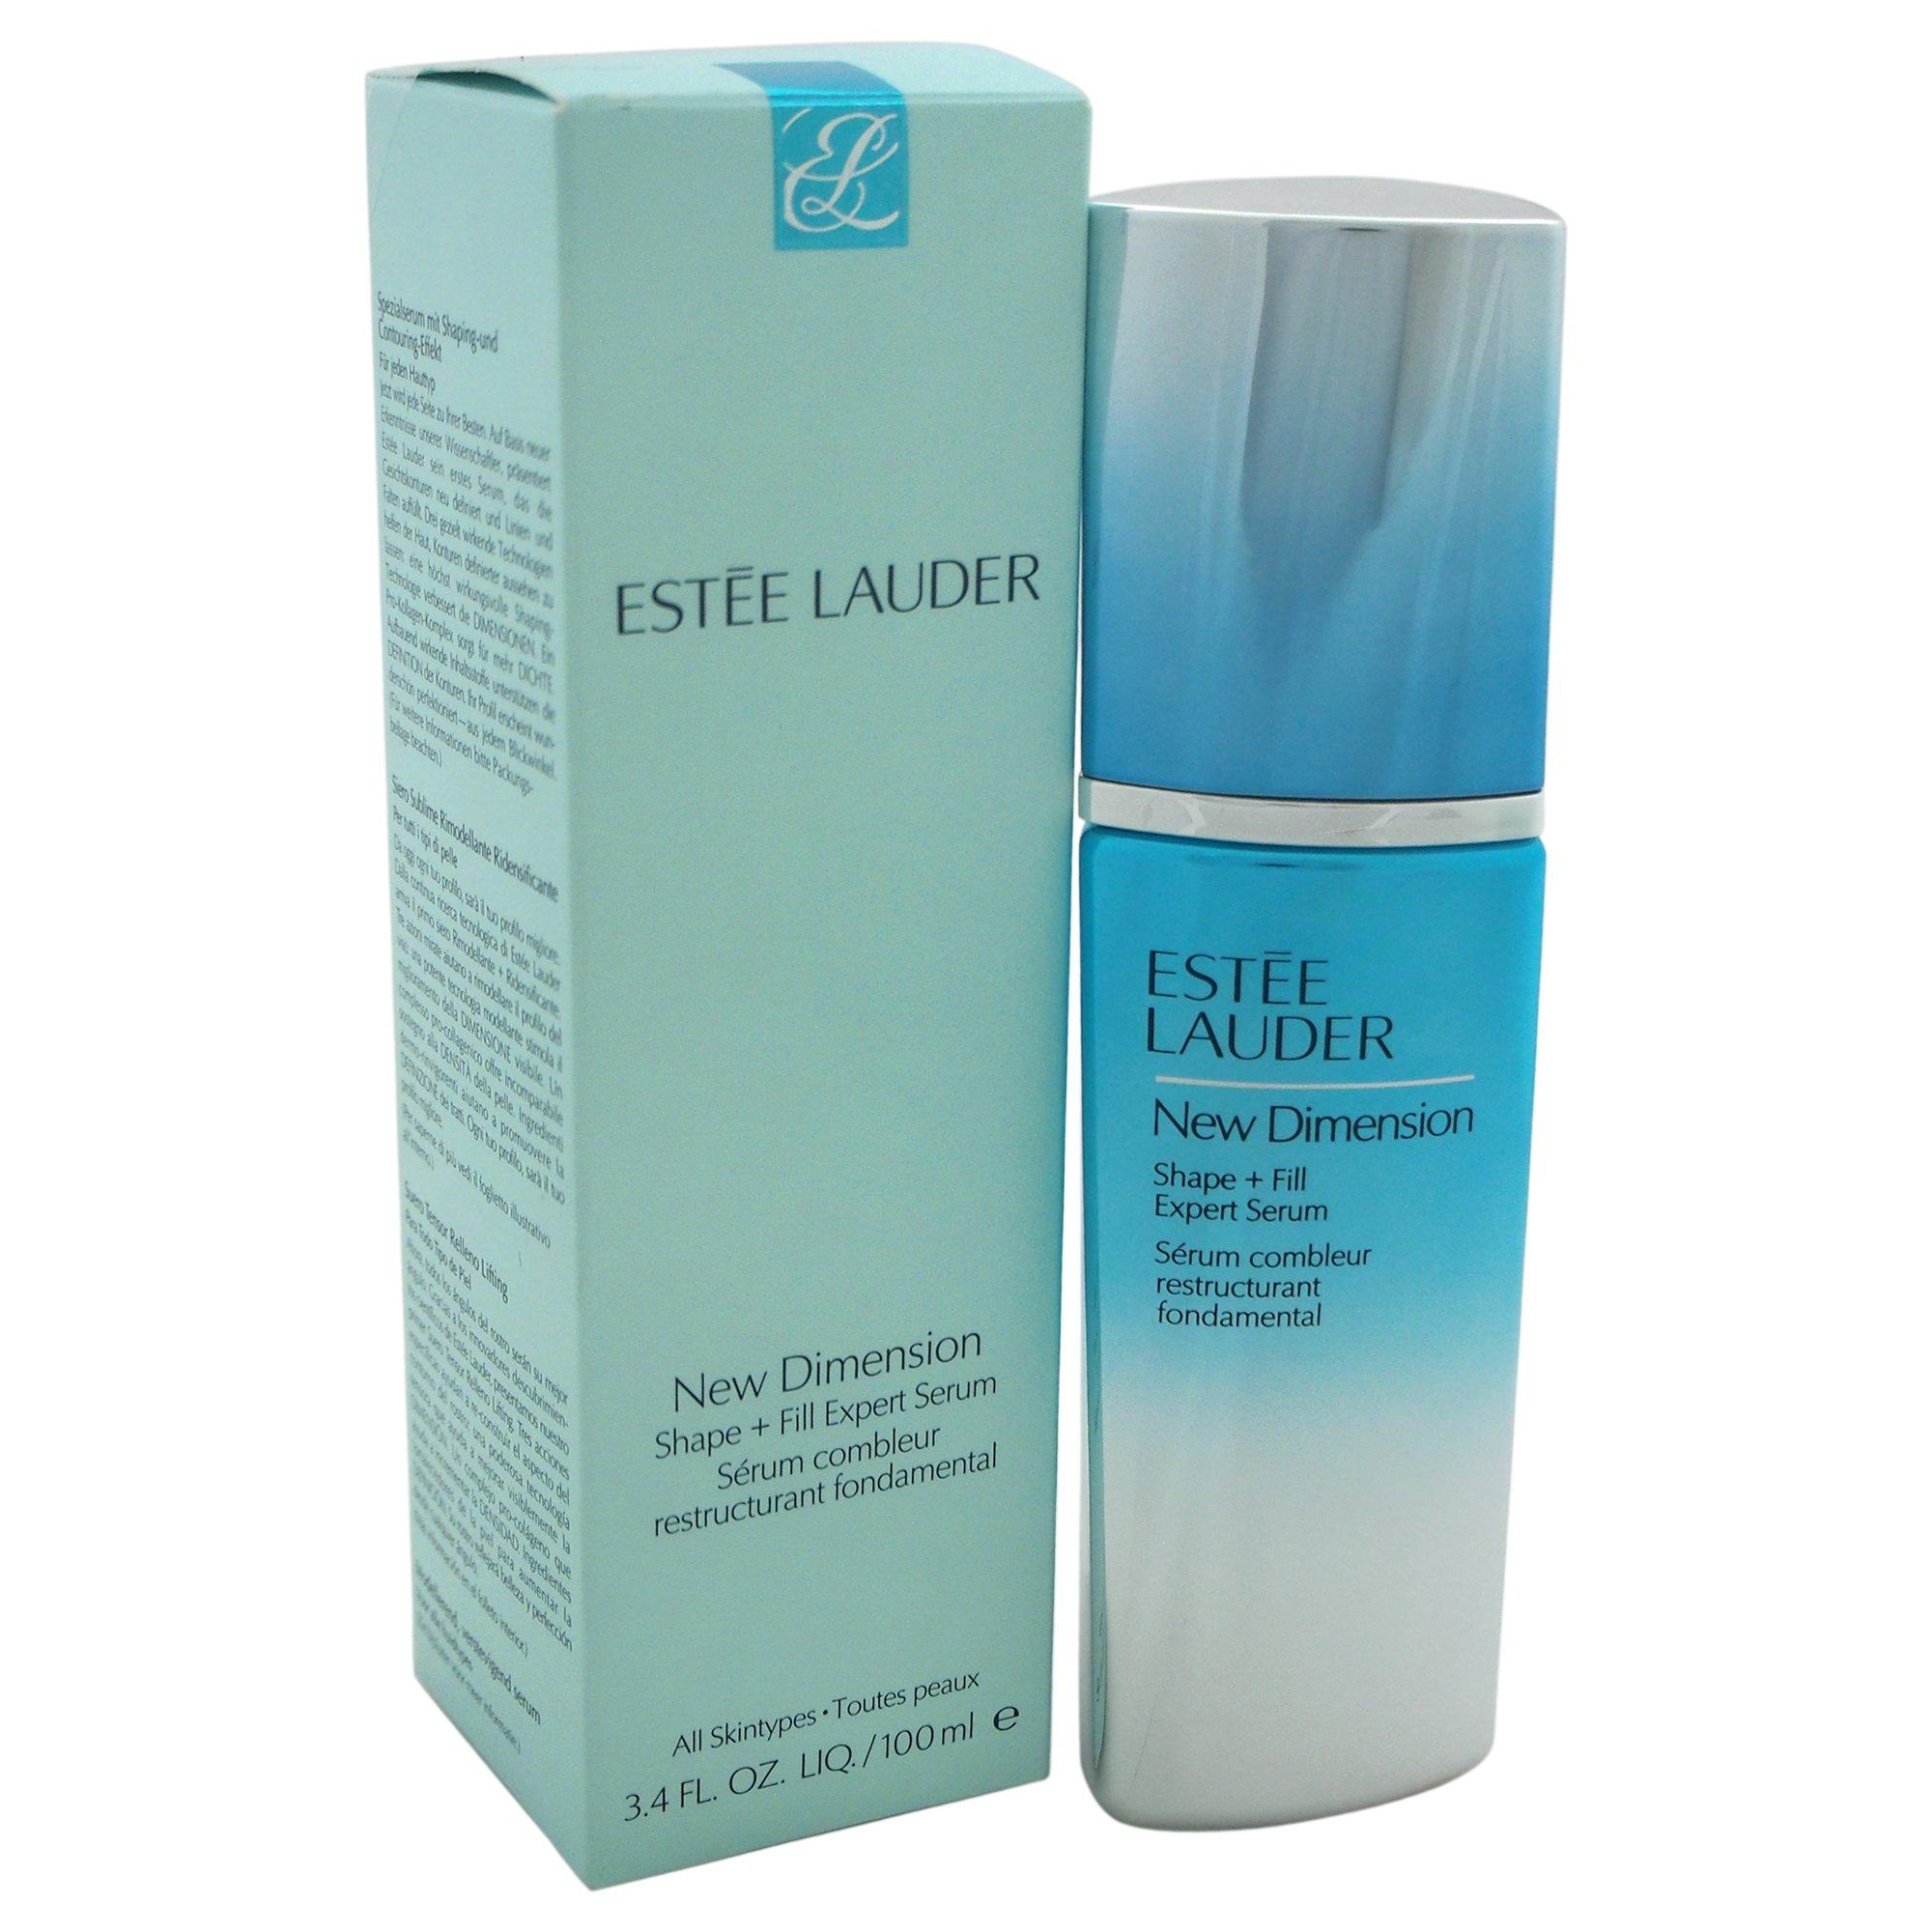 Estee Lauder Women's New Dimension Shape + Fill Expert Serum, All Skin Types, 3.4 Ounce